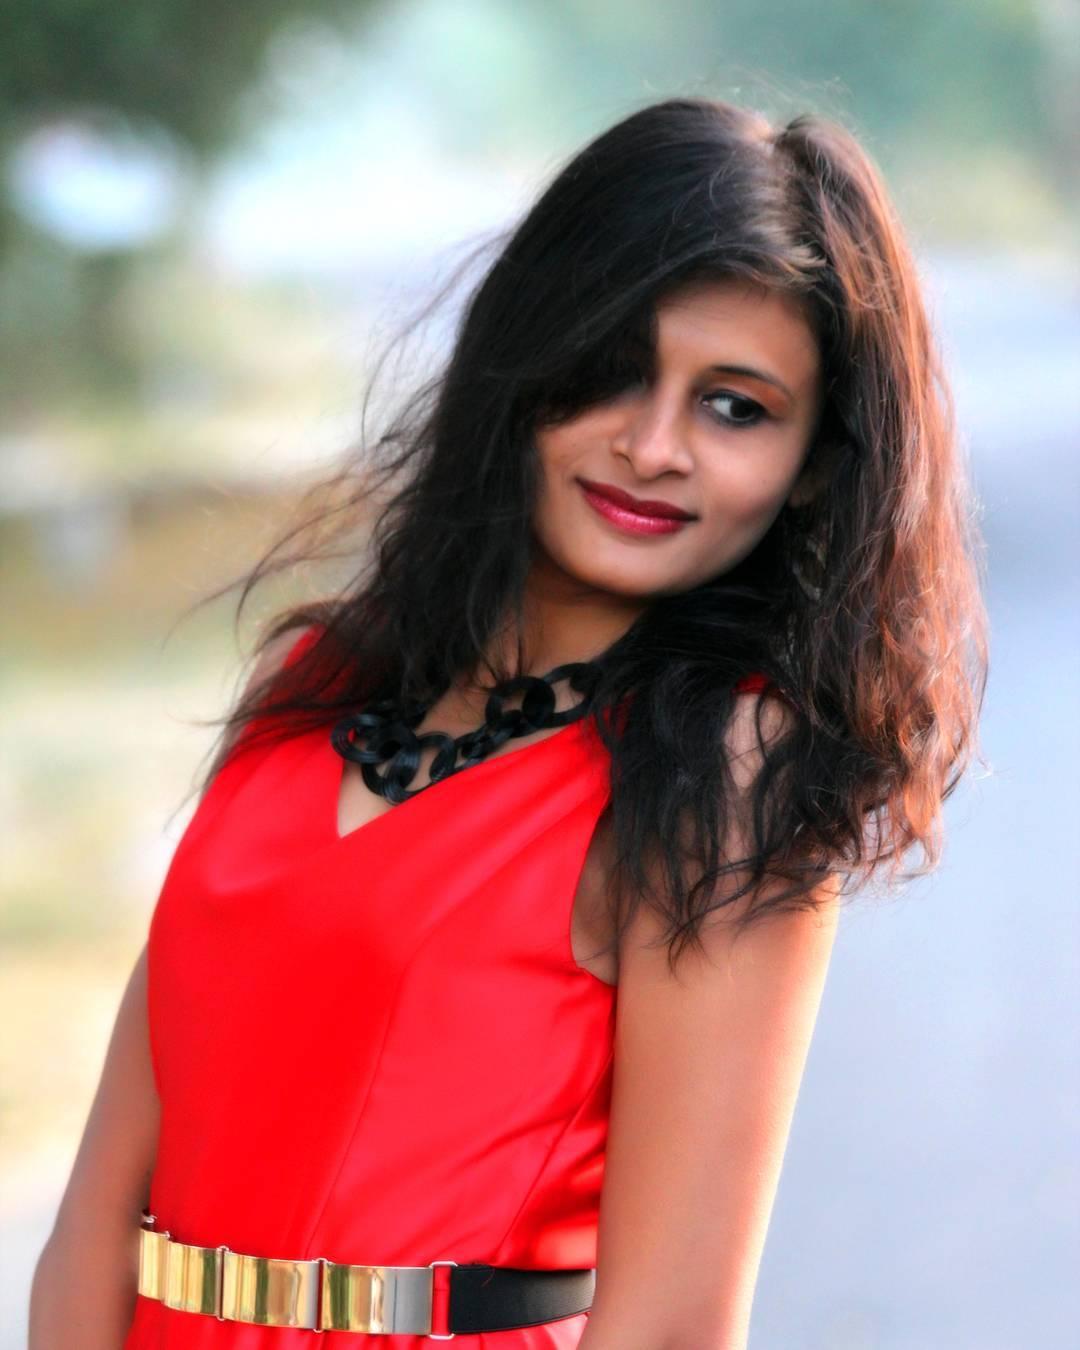 In frame: @mansimodi06  #beautifulwomen #girlsportrait #photoholic #girlsfashions  #portraitphotography #portrait #fashionphotography #FashionShoot #ahmedabad #photography #picoftheday #preetyface #boldness #modelpose #modelphotography #AhmedabadPhotography #shootout_ahmedabad  #ahmedabaddiaries #ahmedabadshoutout #MementoPhotography